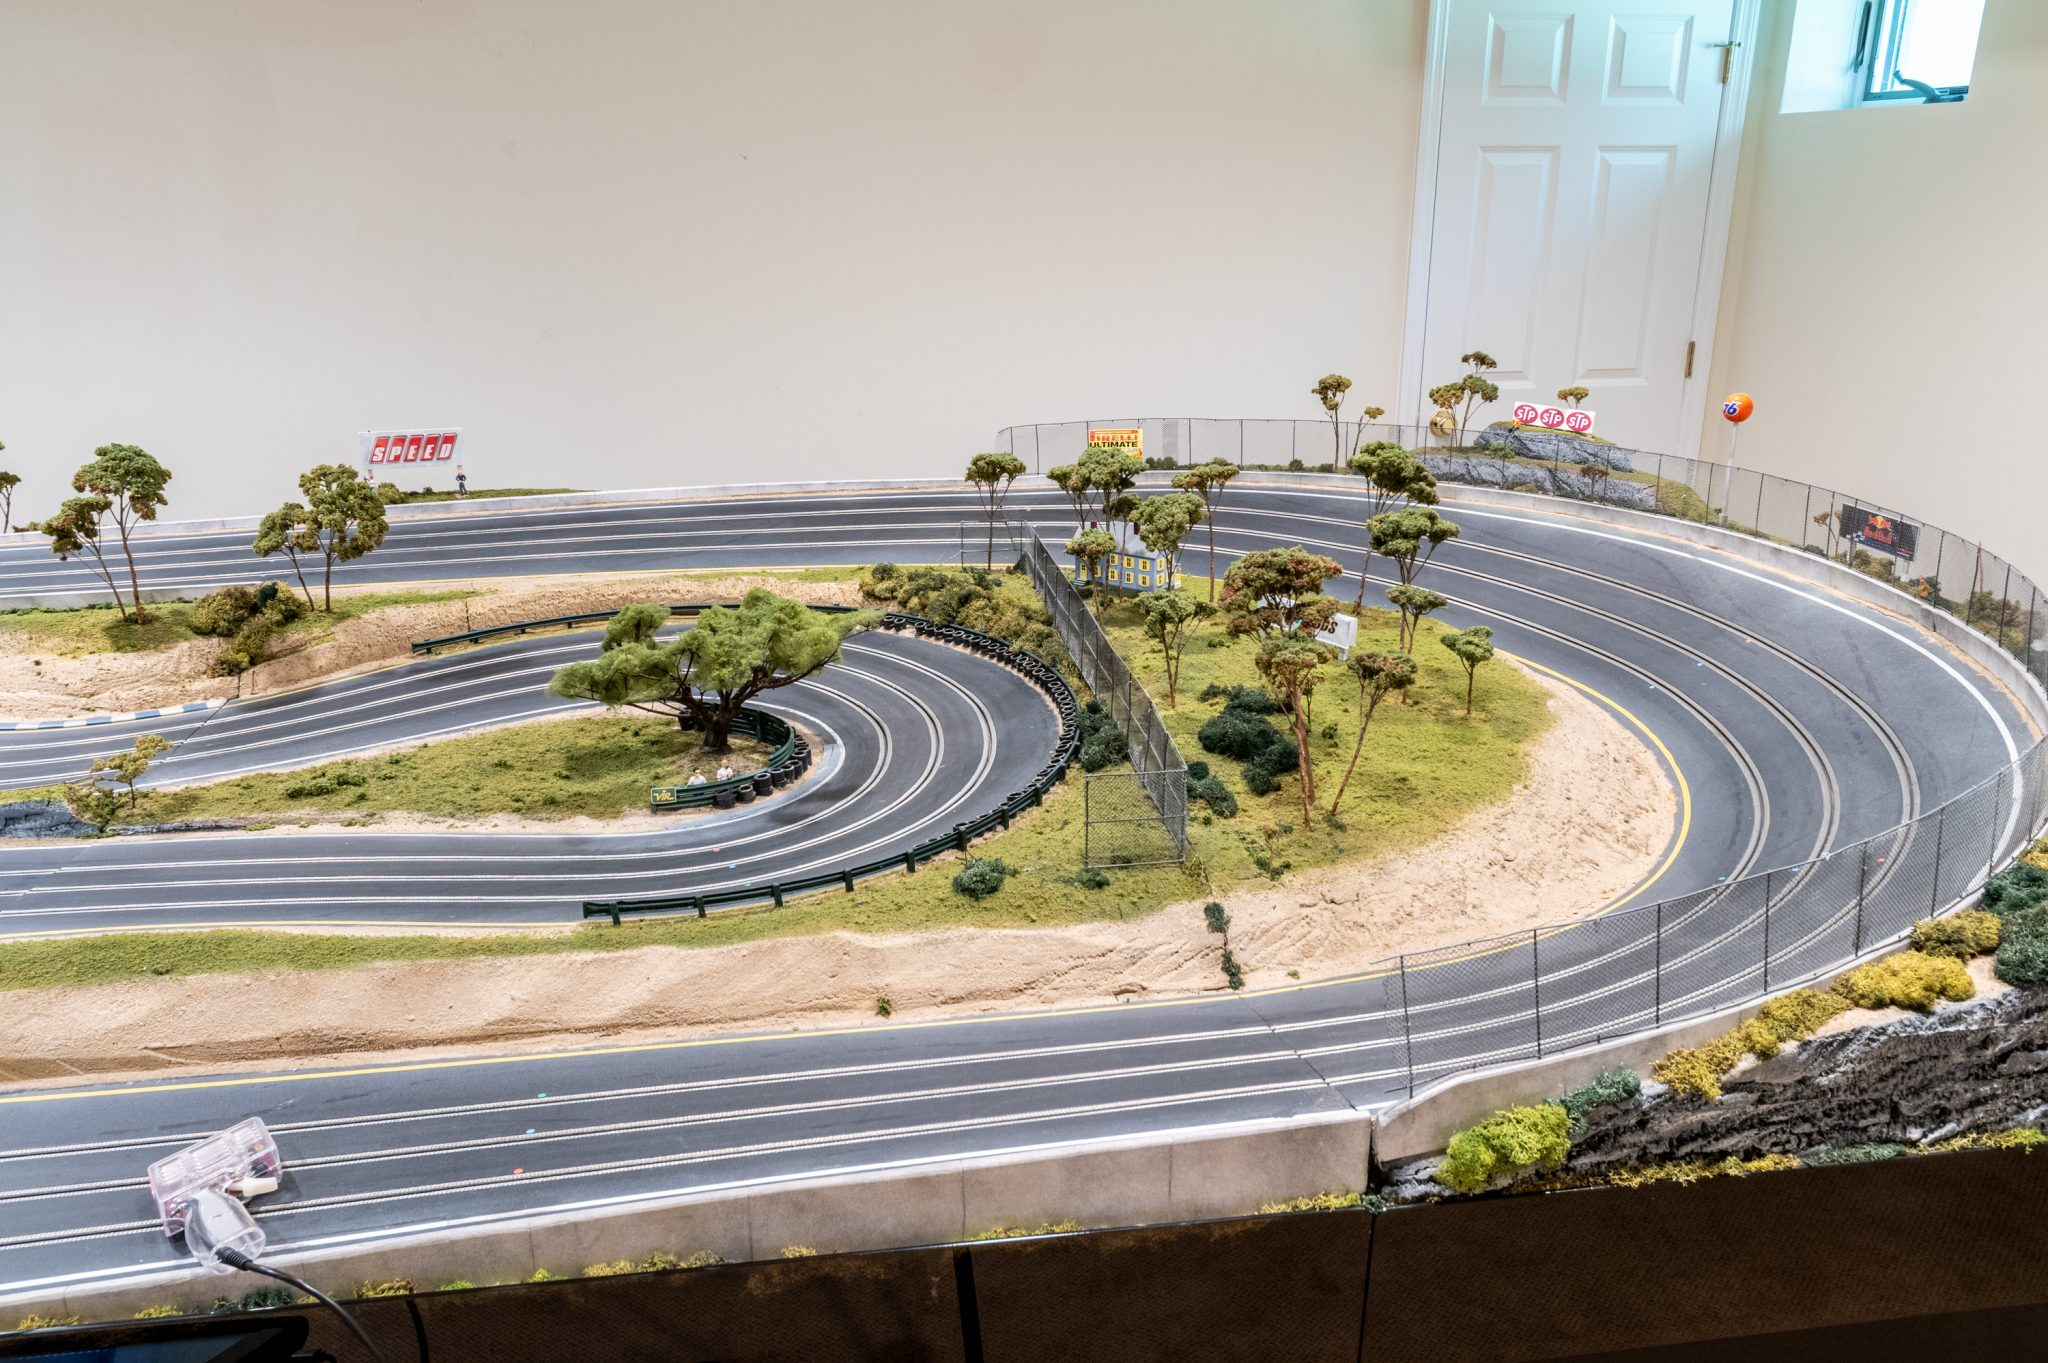 Slot Car Racetrack turns